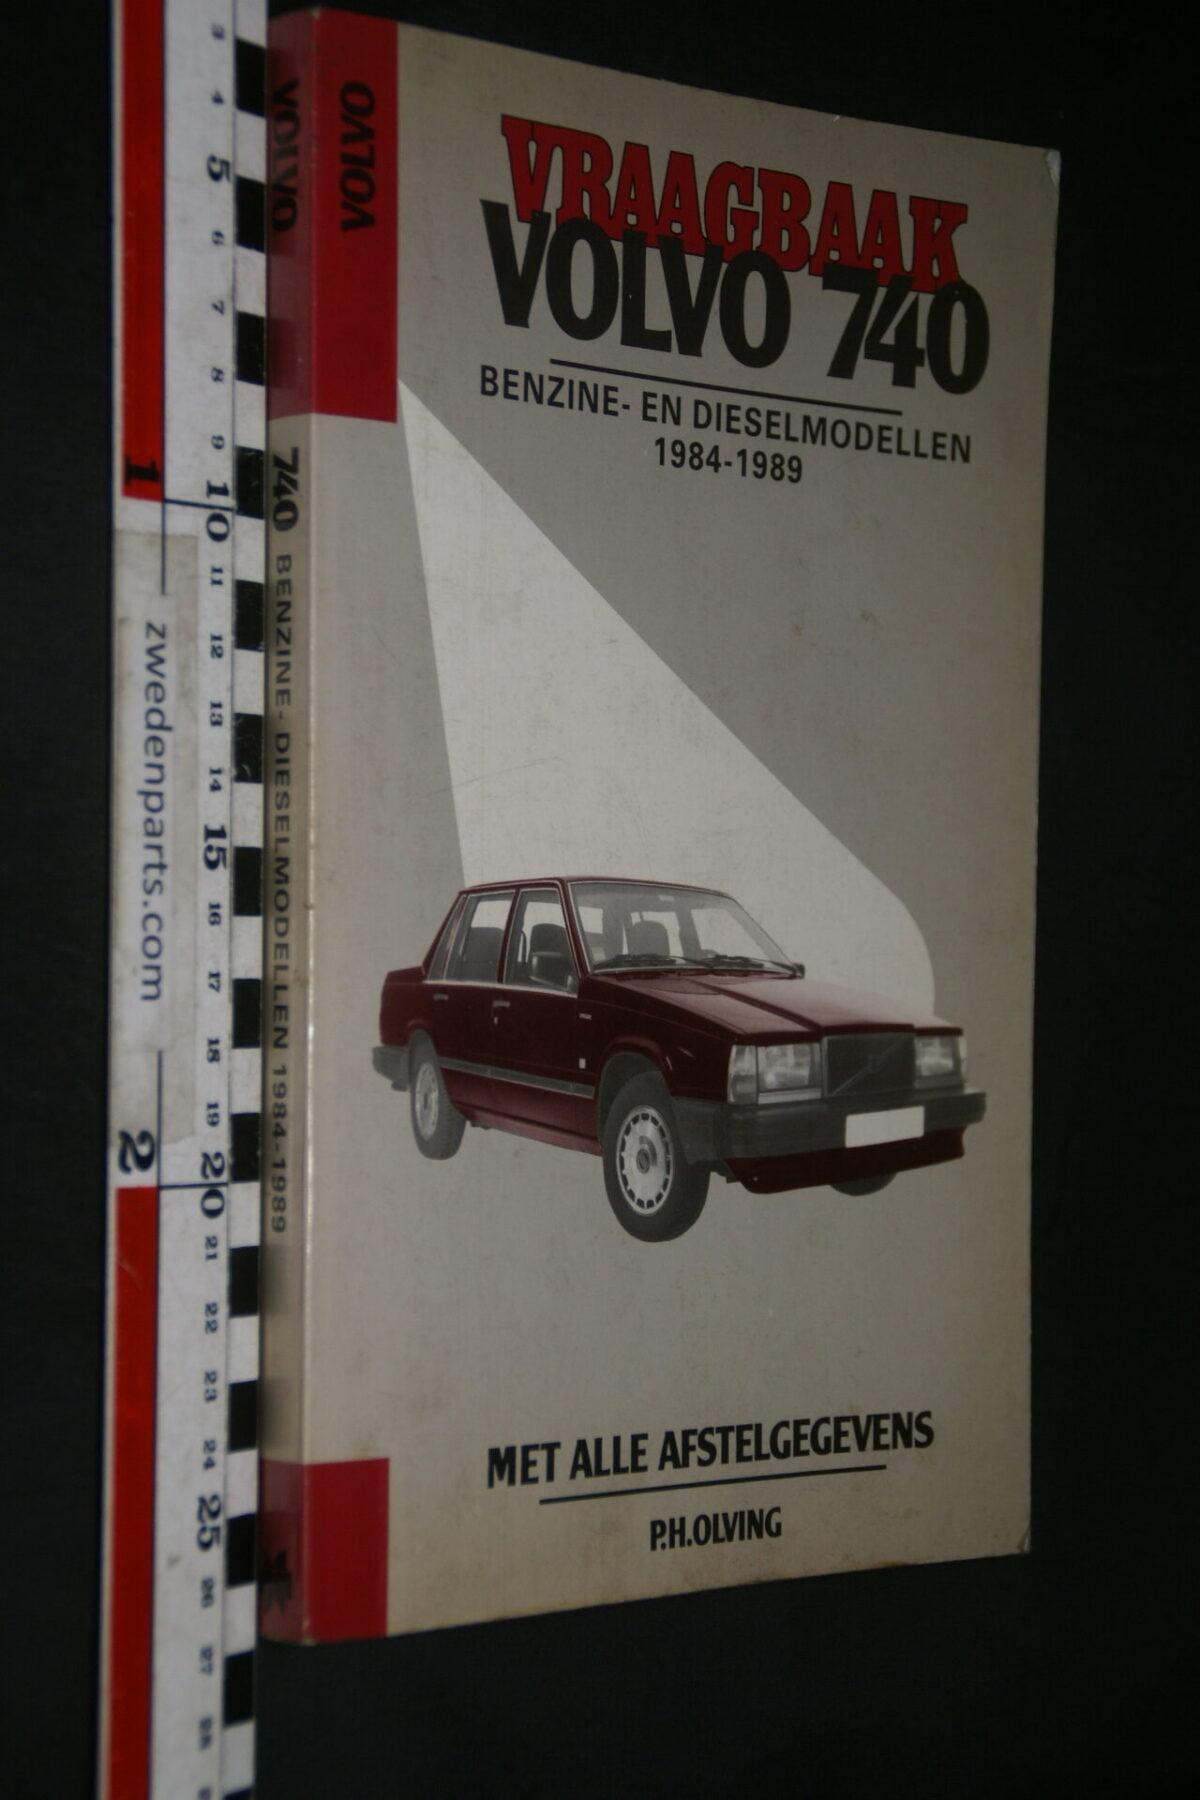 DSC03648 origineel Kluwer boek Vraagbaak Volvo 740  nr ISBN 9020122541-d735a7b6